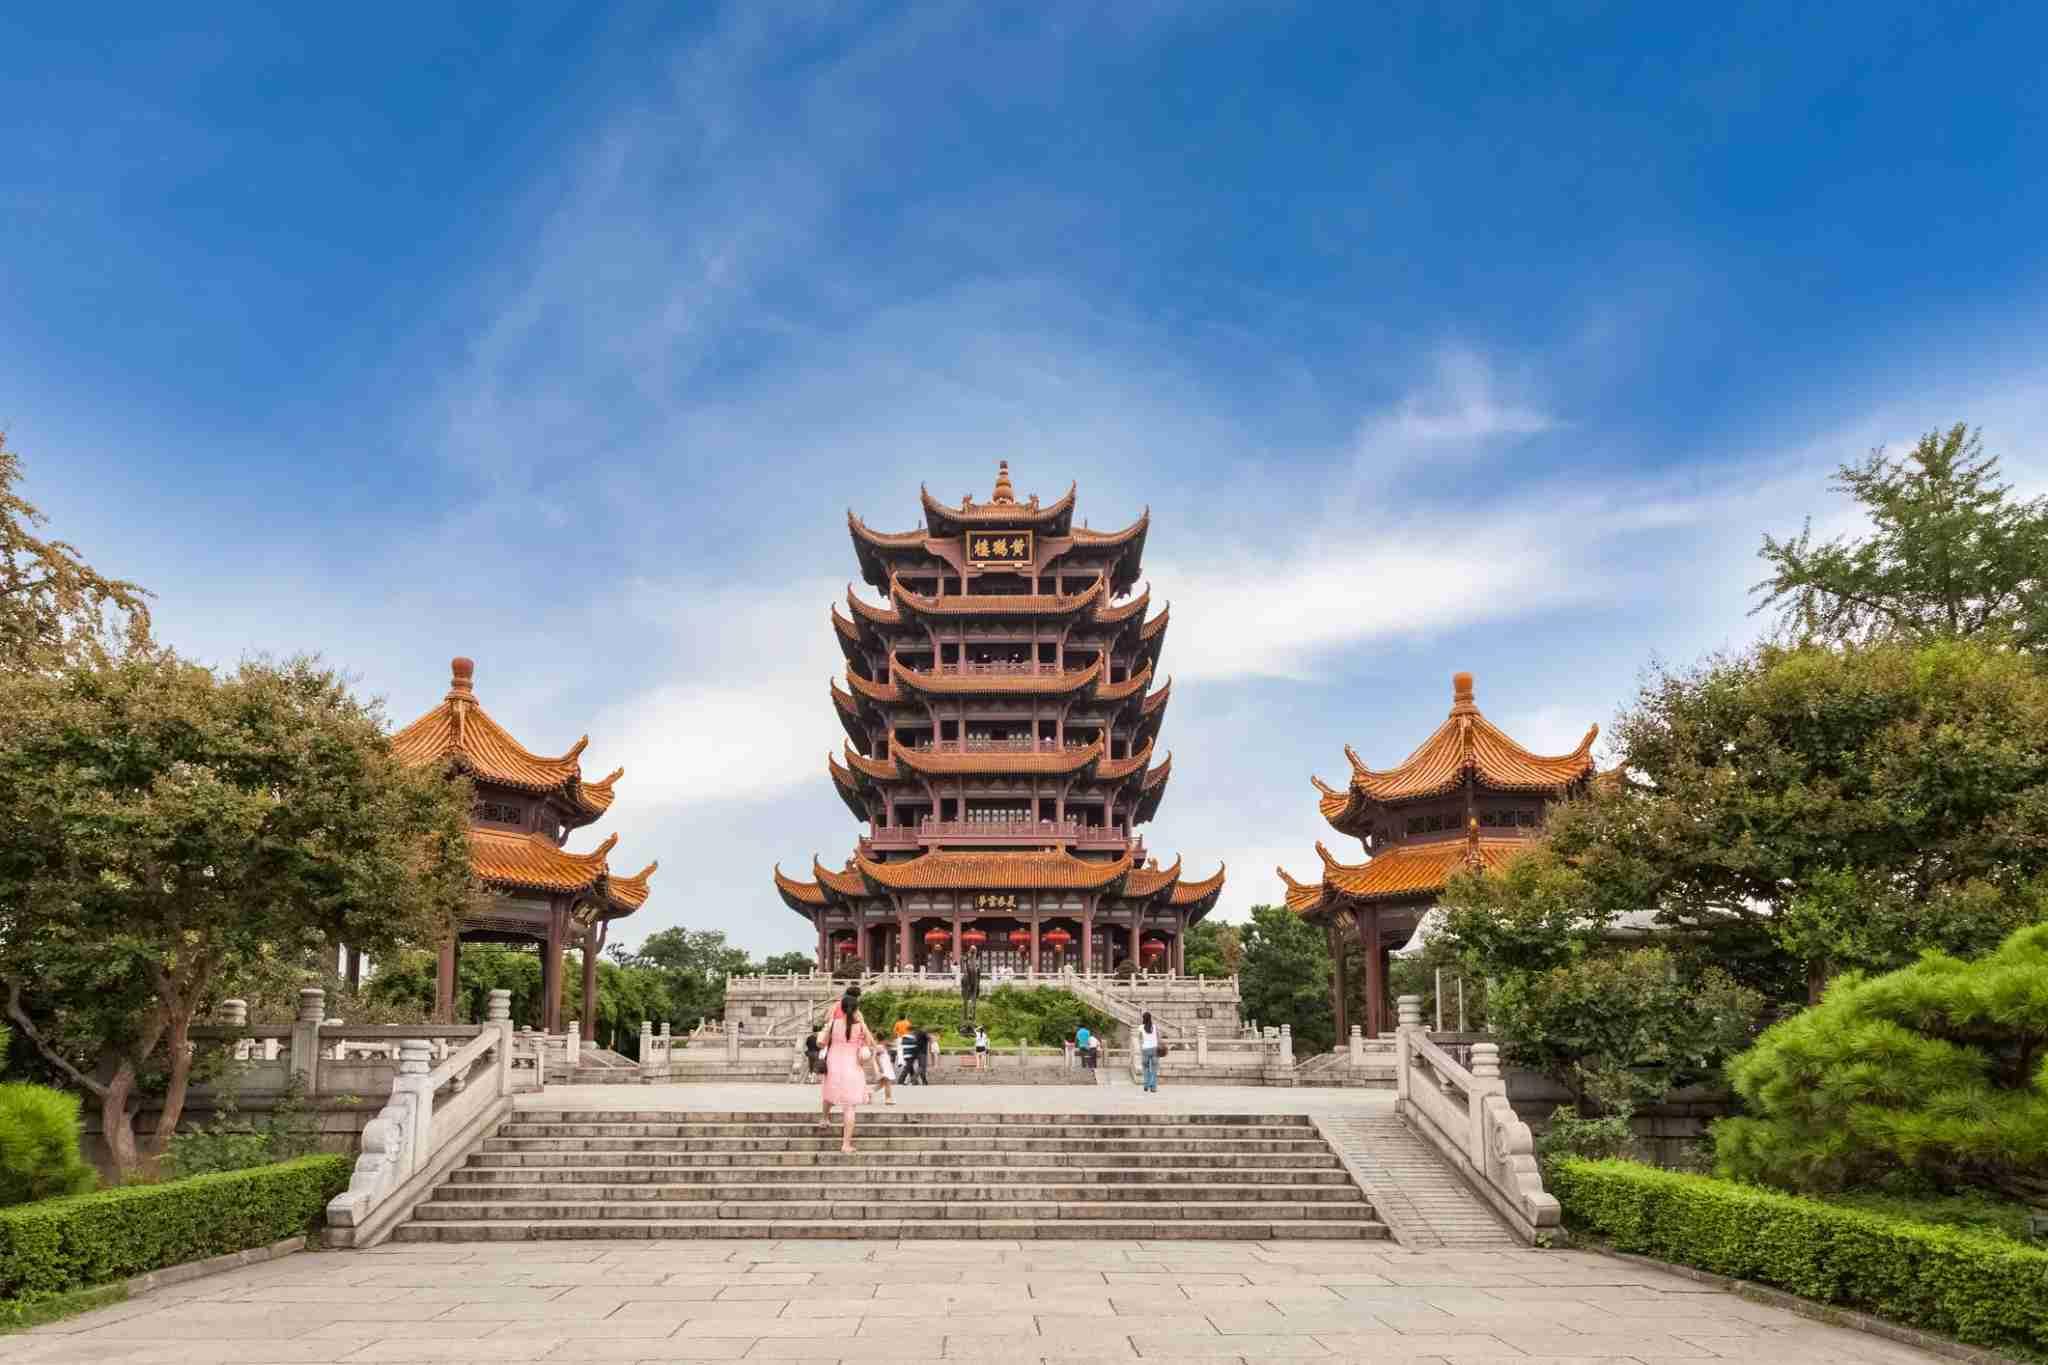 Yellow Crane Tower in Wuhan, China. (Photo by silkwayrain)